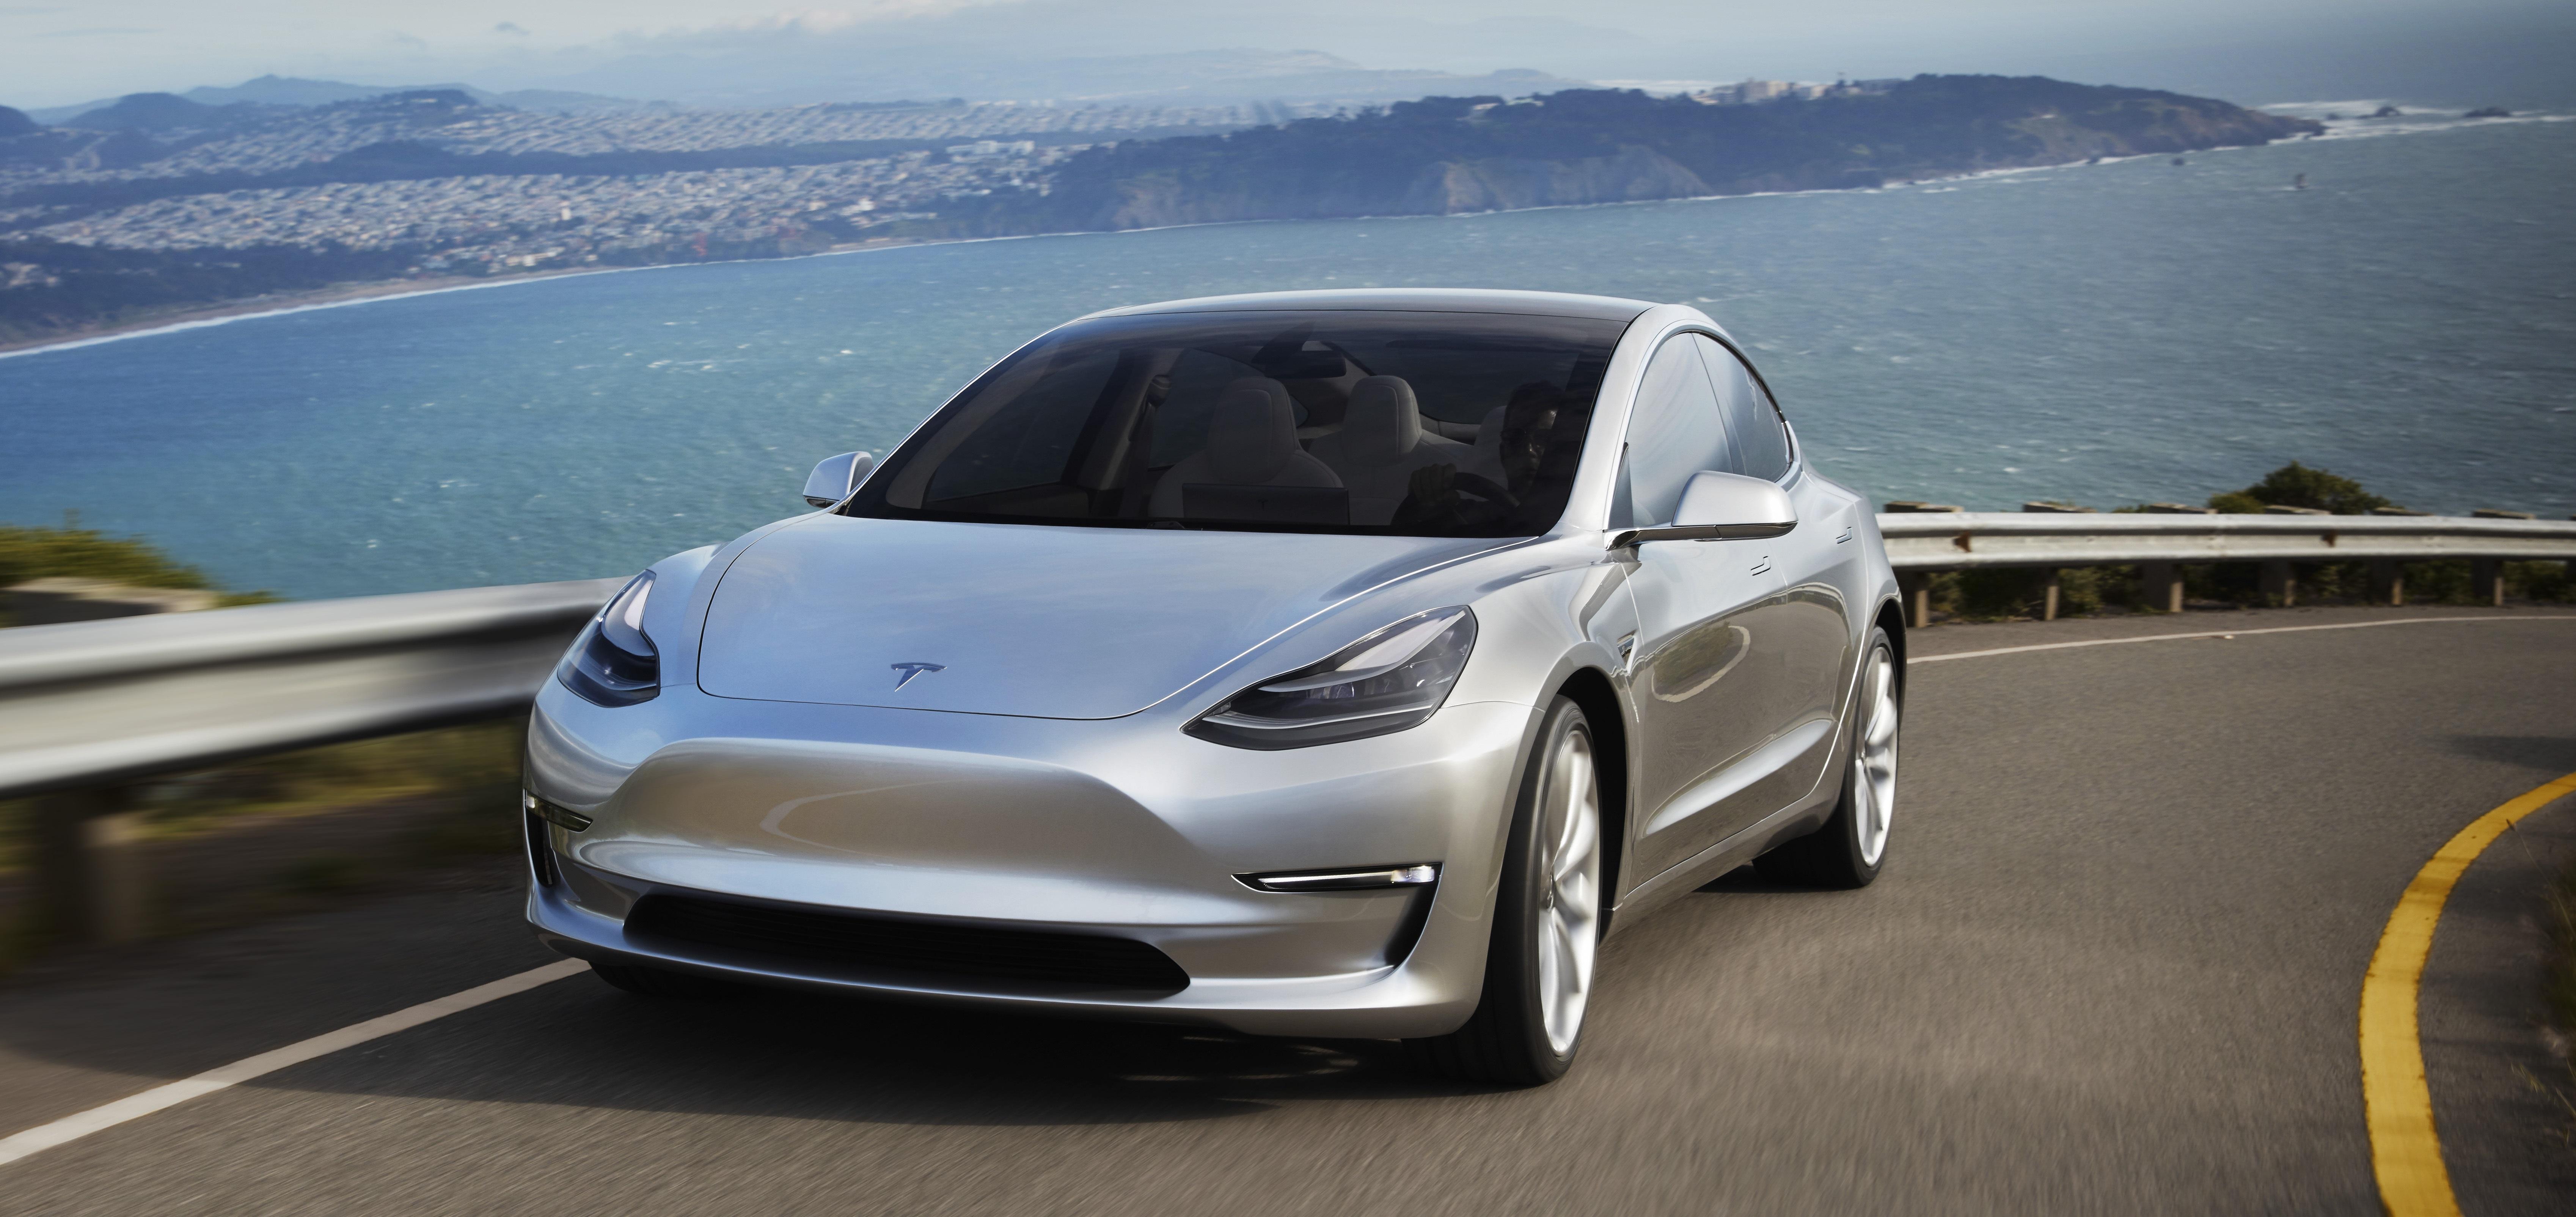 Bmw Pick Up Truck >> Tesla Model 3 - Electrek